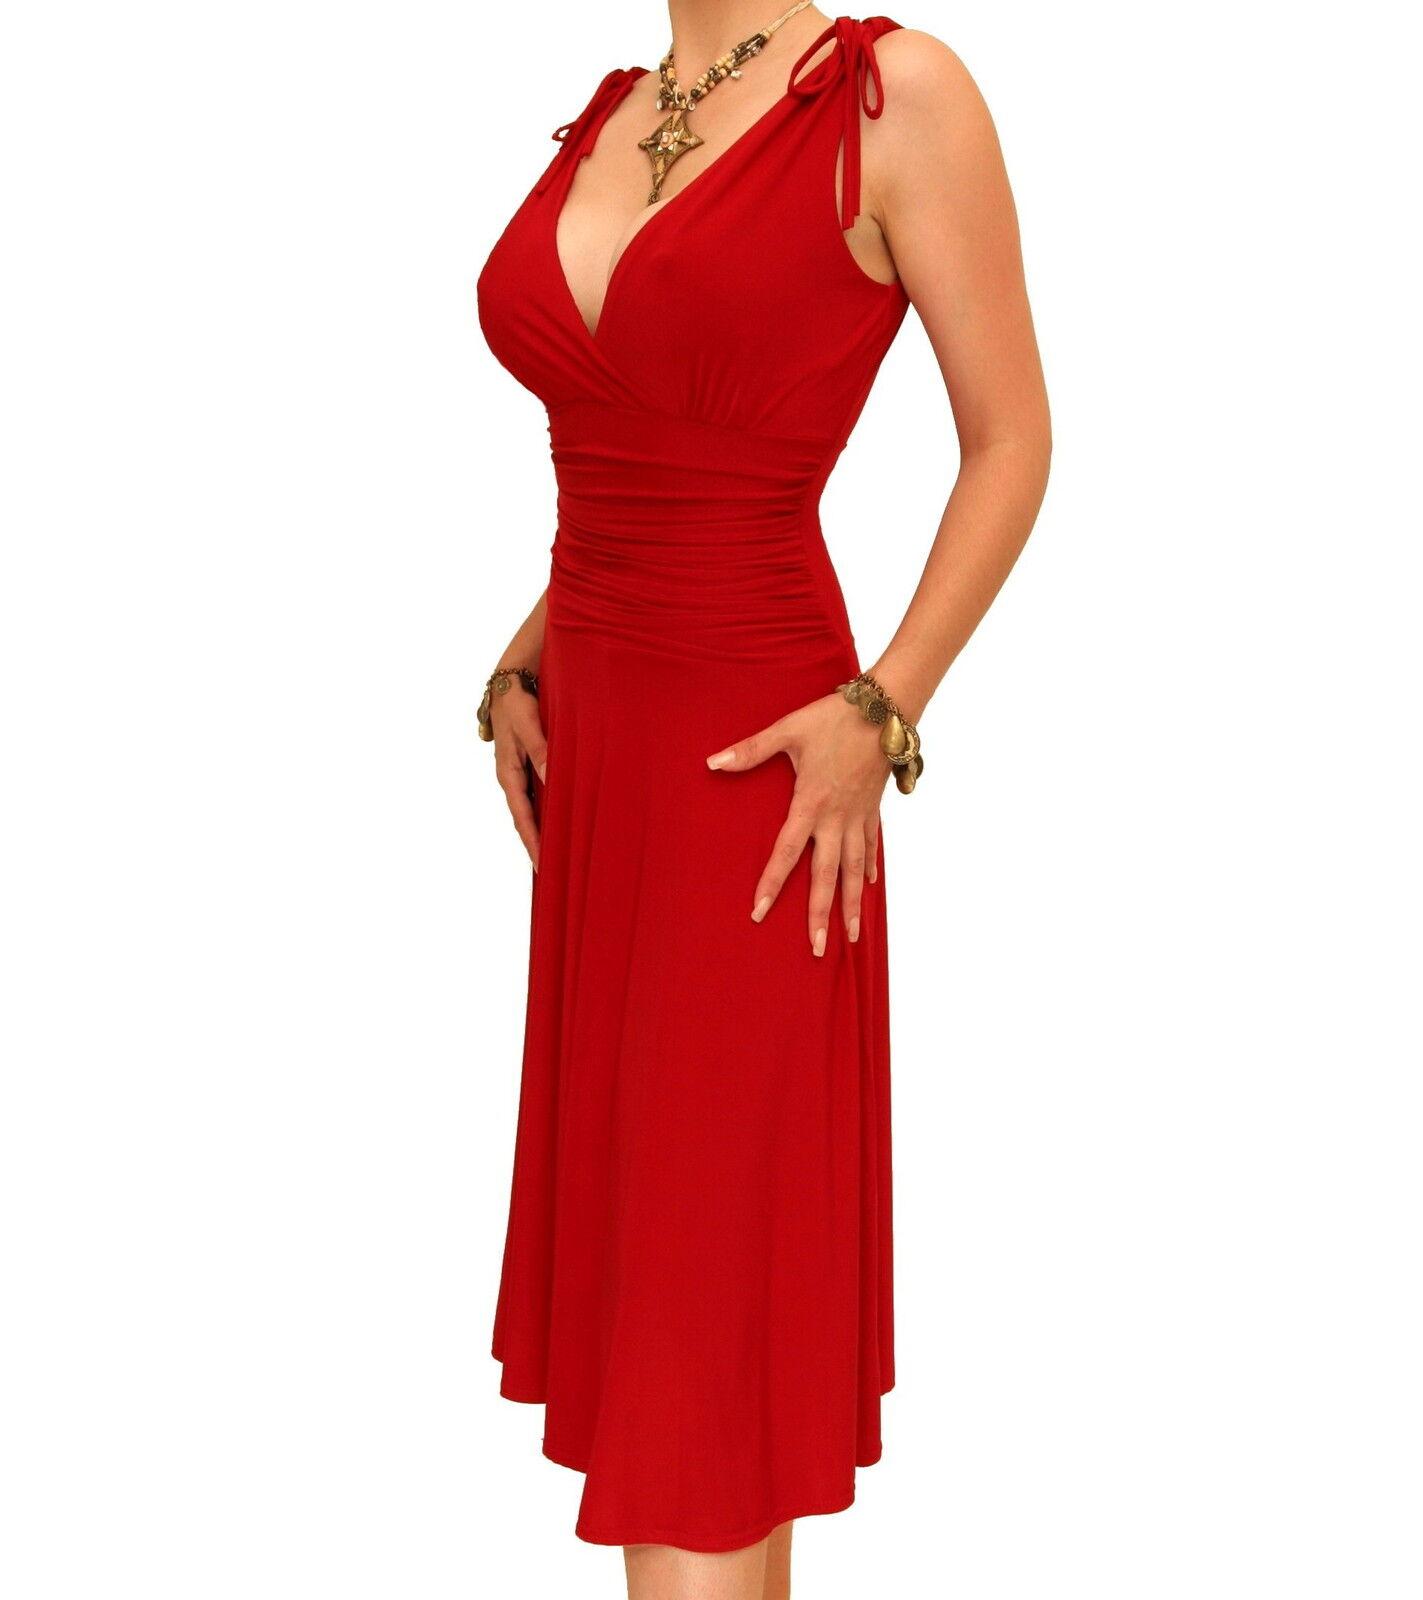 New Elegant Grecian Style Evening Dress - Knee Length